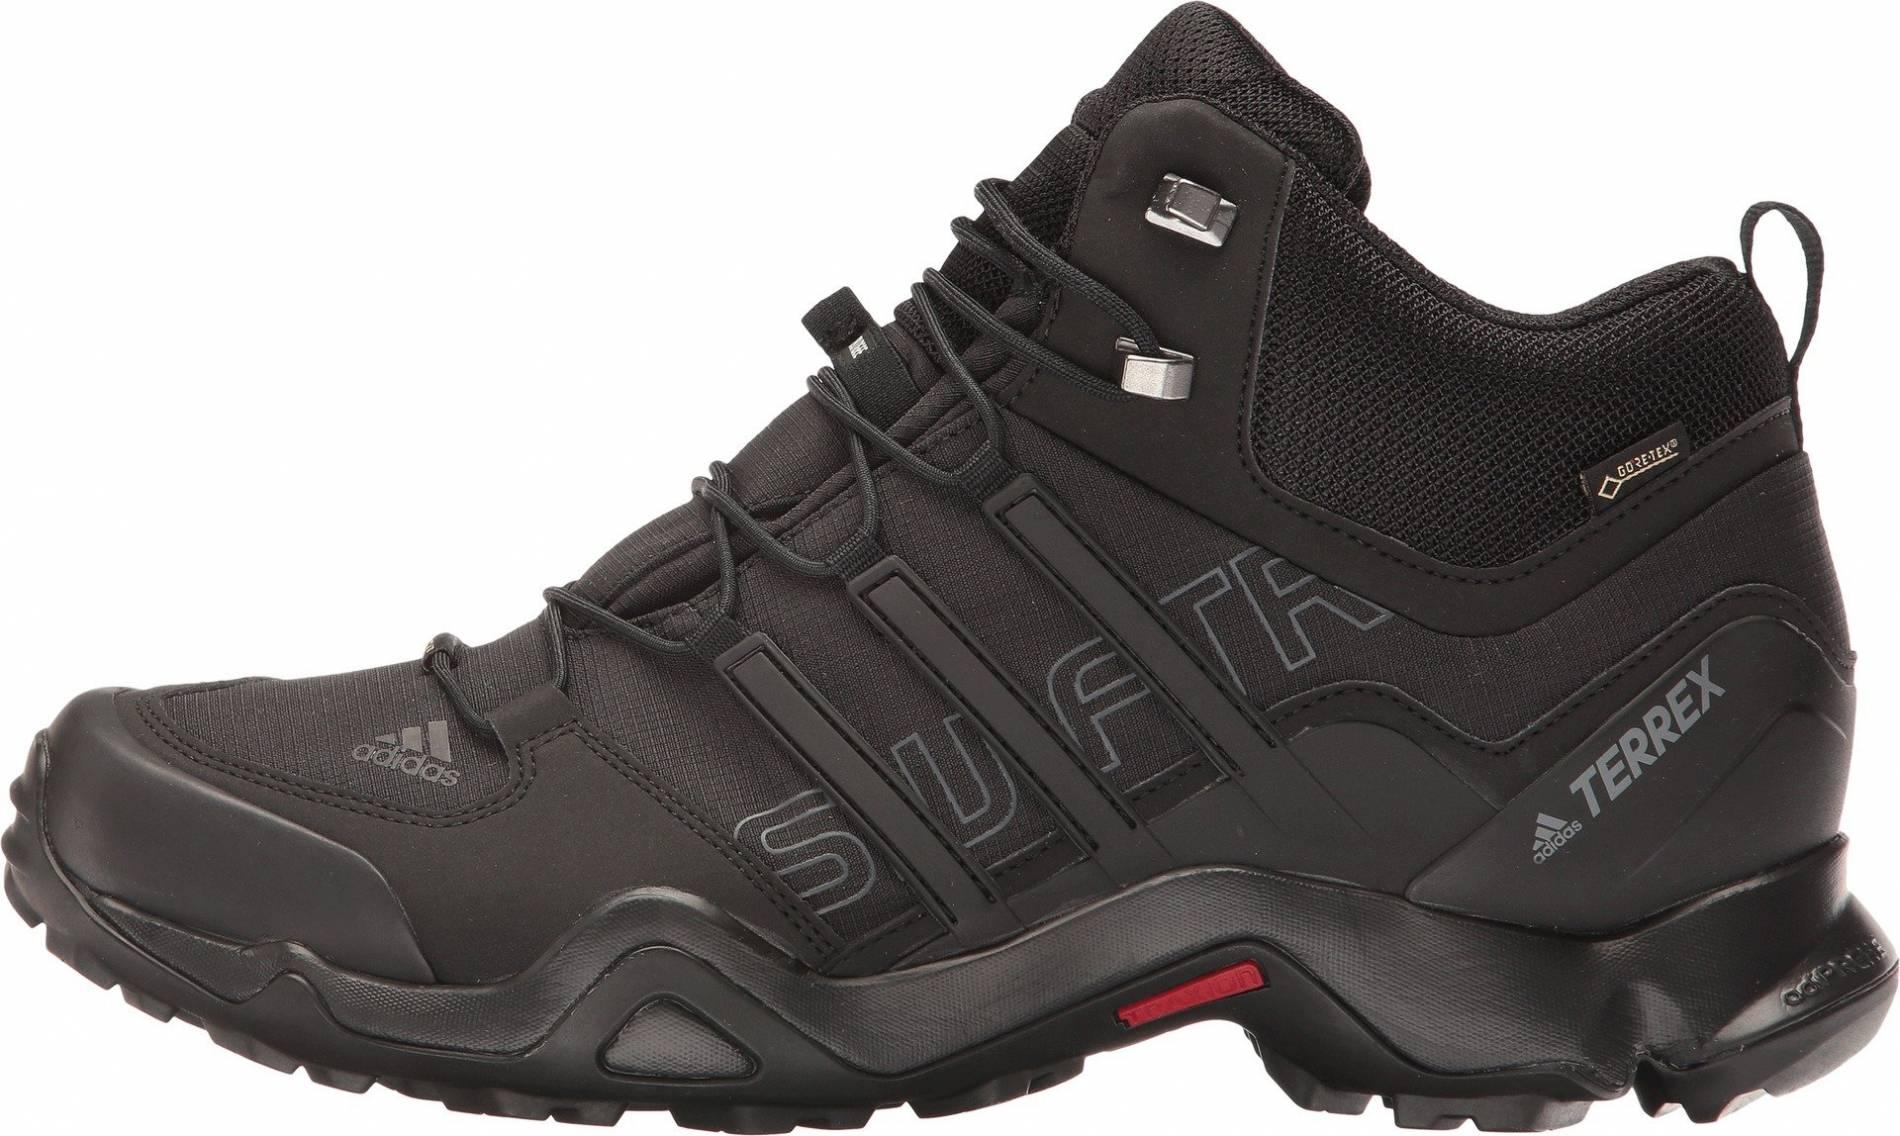 Save 38% on Adidas Hiking Boots (12